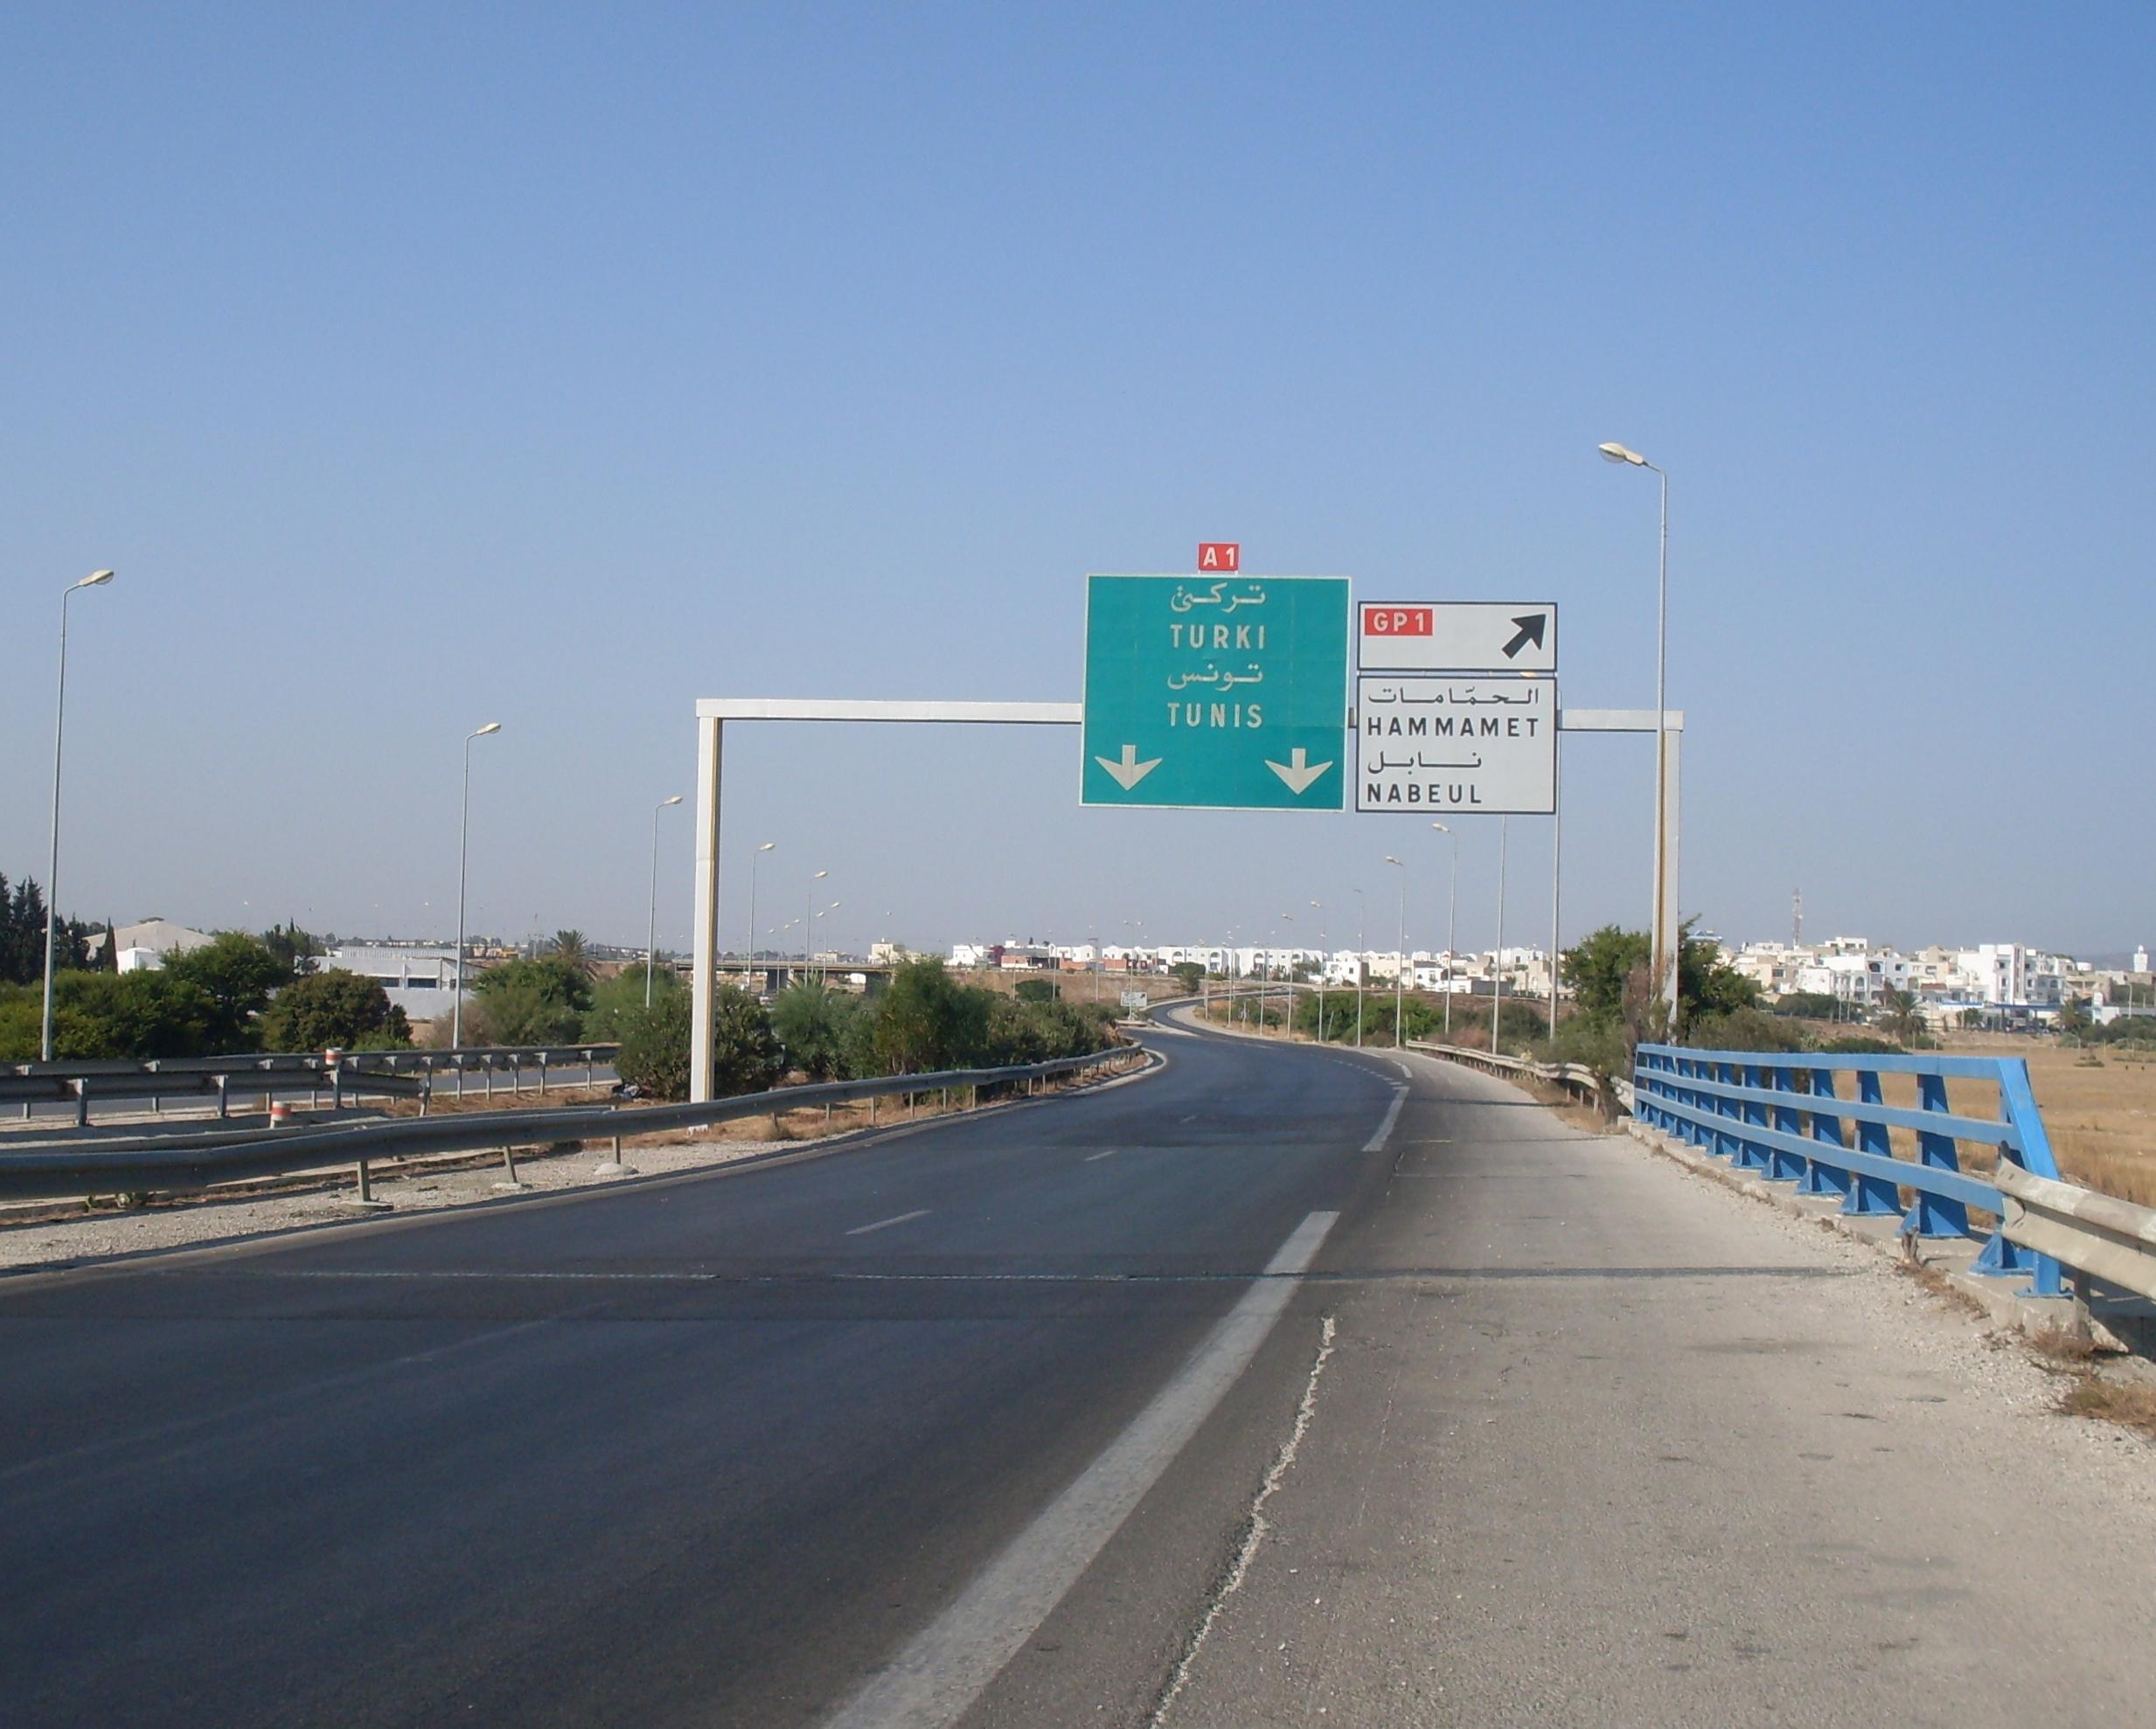 File:Tunisie Autoroute A1 sortie Hammamet.jpg - Wikimedia Commons Road Direction Signs